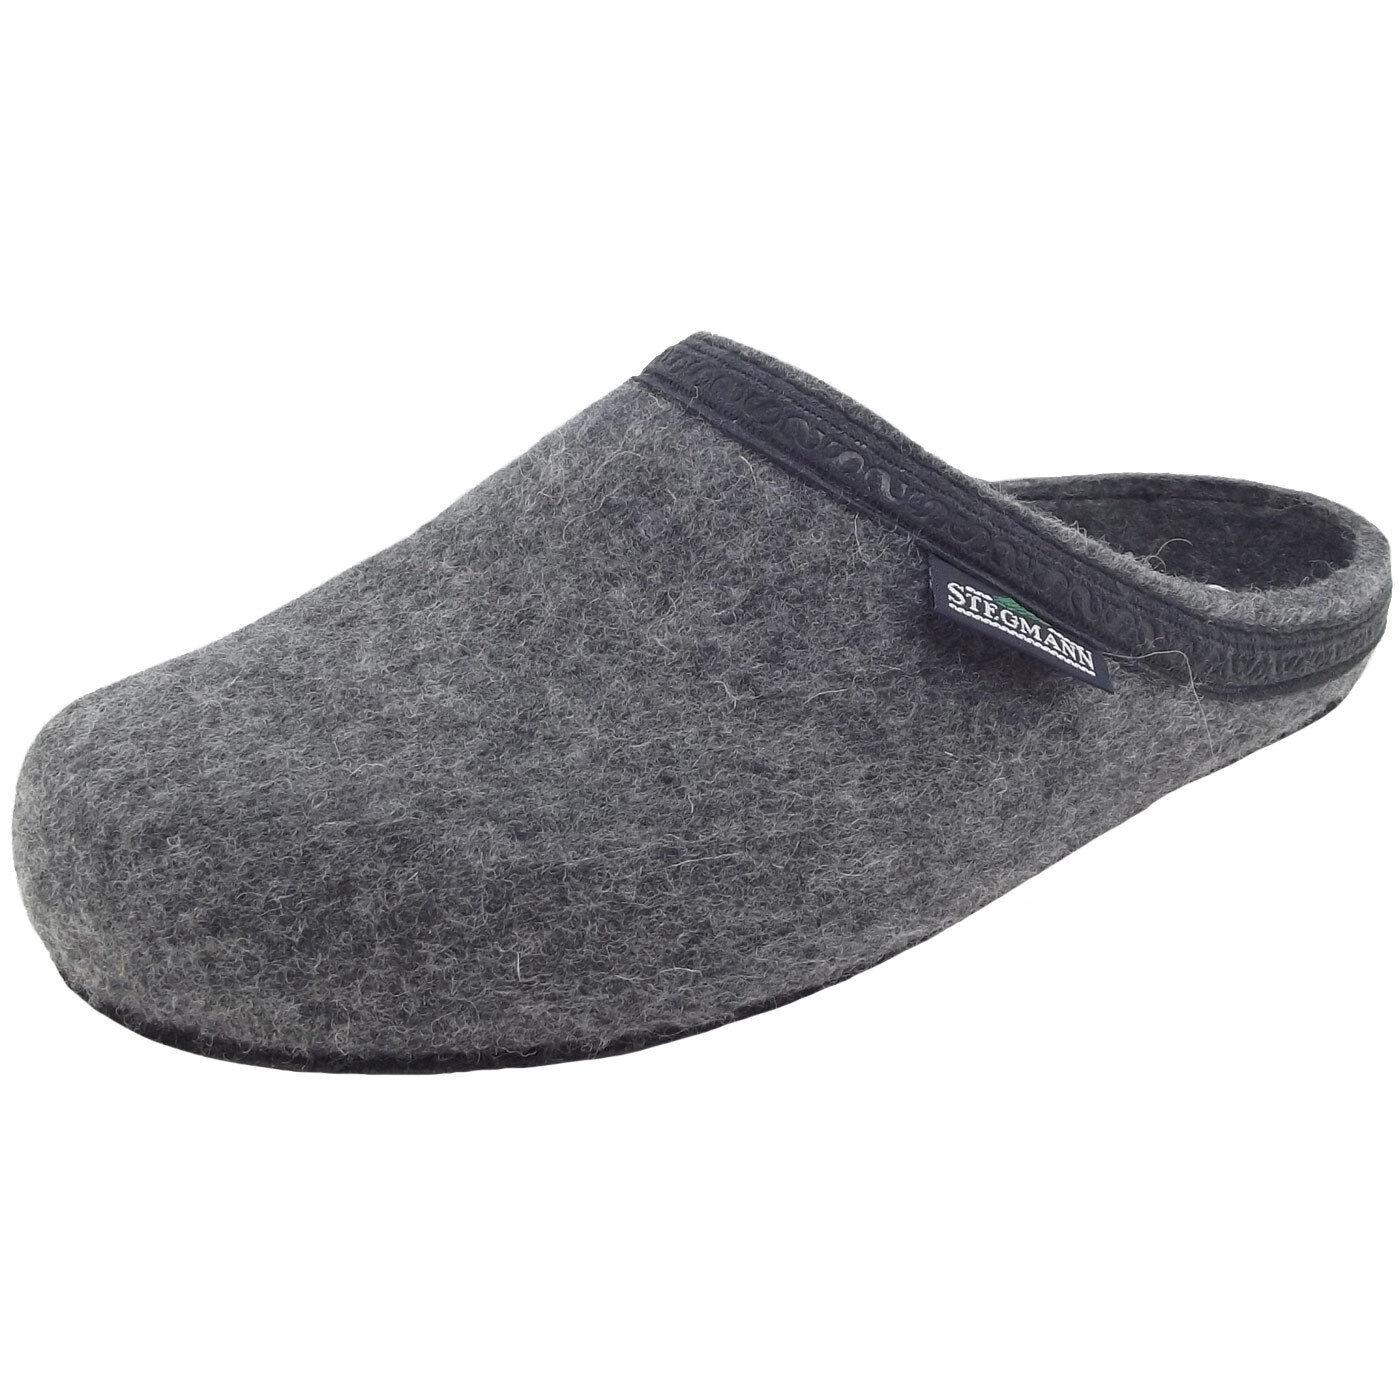 Stegmann 127 Unisex Wollfilz-Pantoffeln grey (grey)